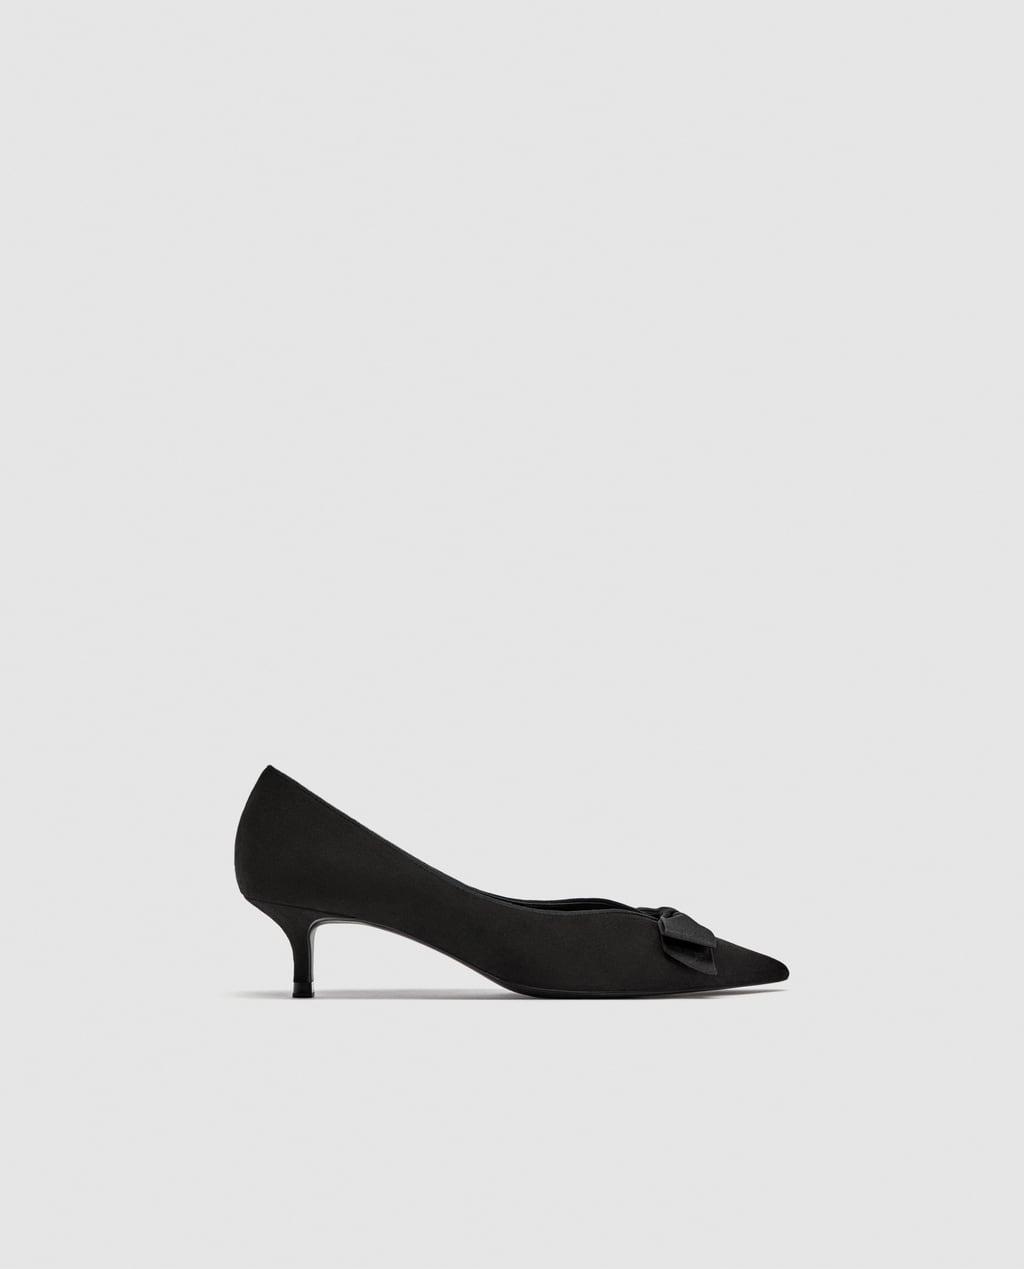 https://www.zara.com/ca/en/mid-heel-court-shoes-with-bow-detail-p12210301.html?v1=5345502&v2=358018